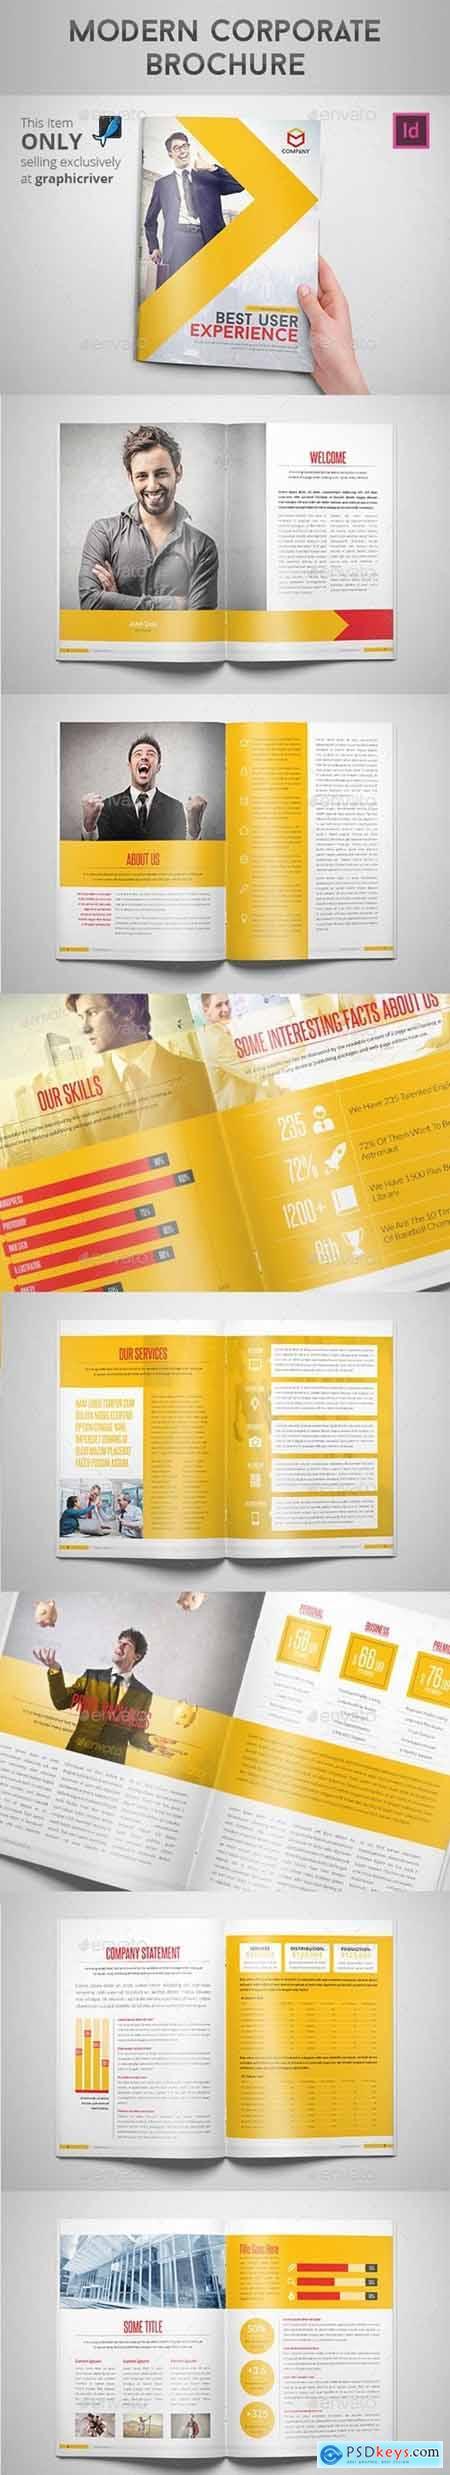 Modern Corporate Brochure 8923626